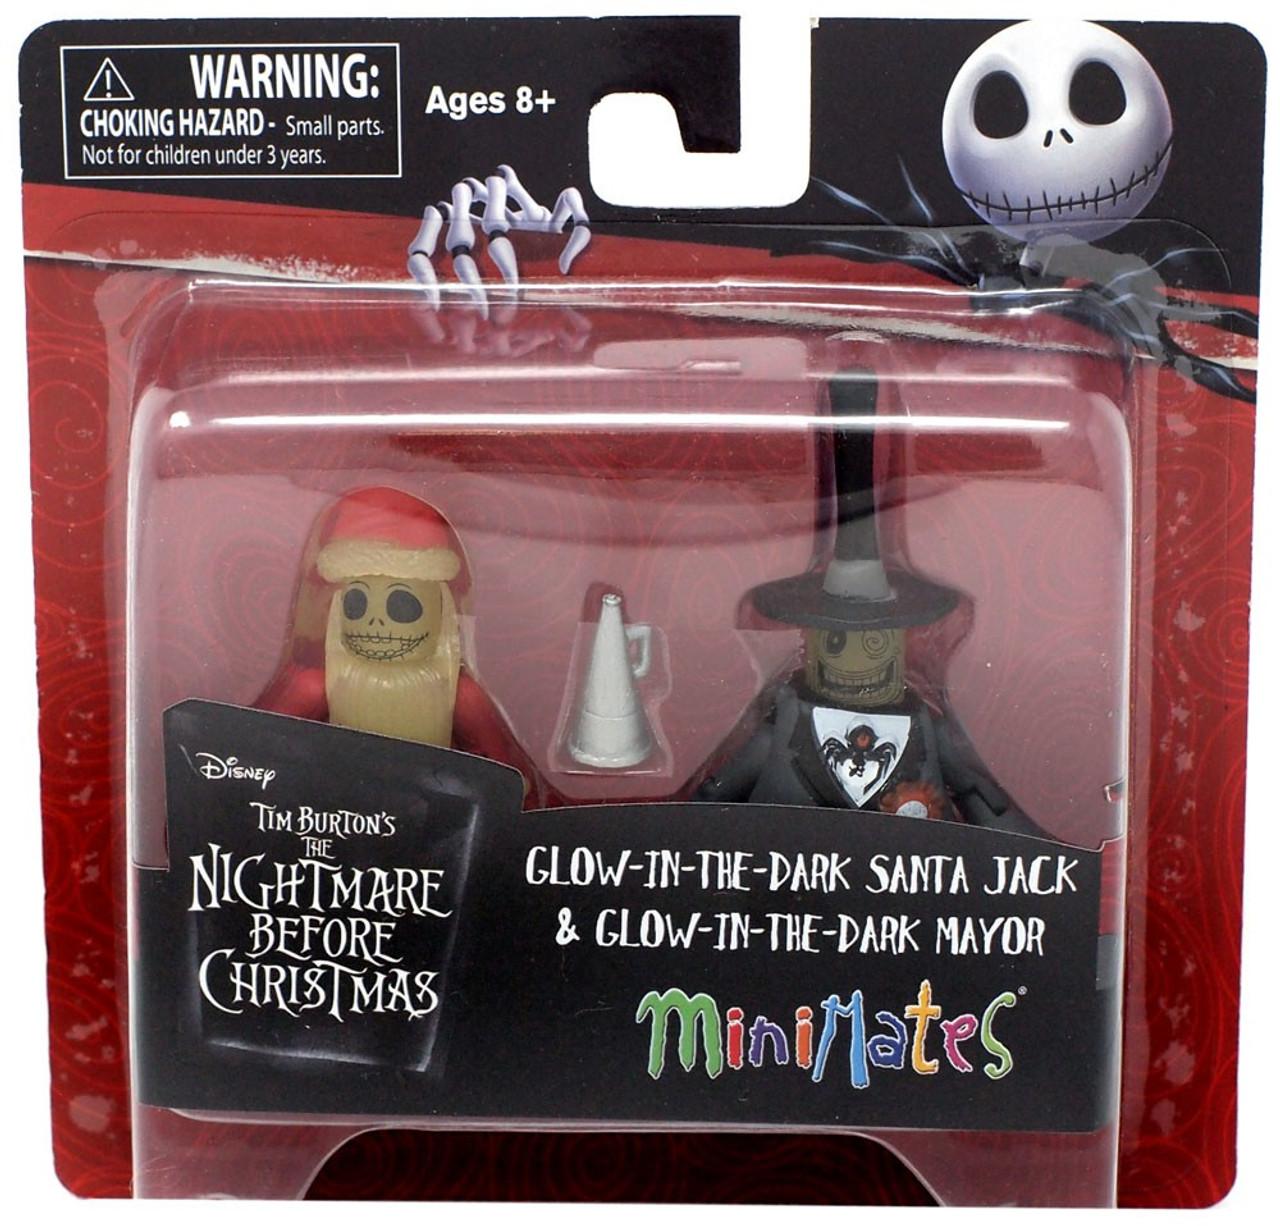 Nightmare Before Christmas Minimates Series 5 Glow-in-the-Dark Mayor